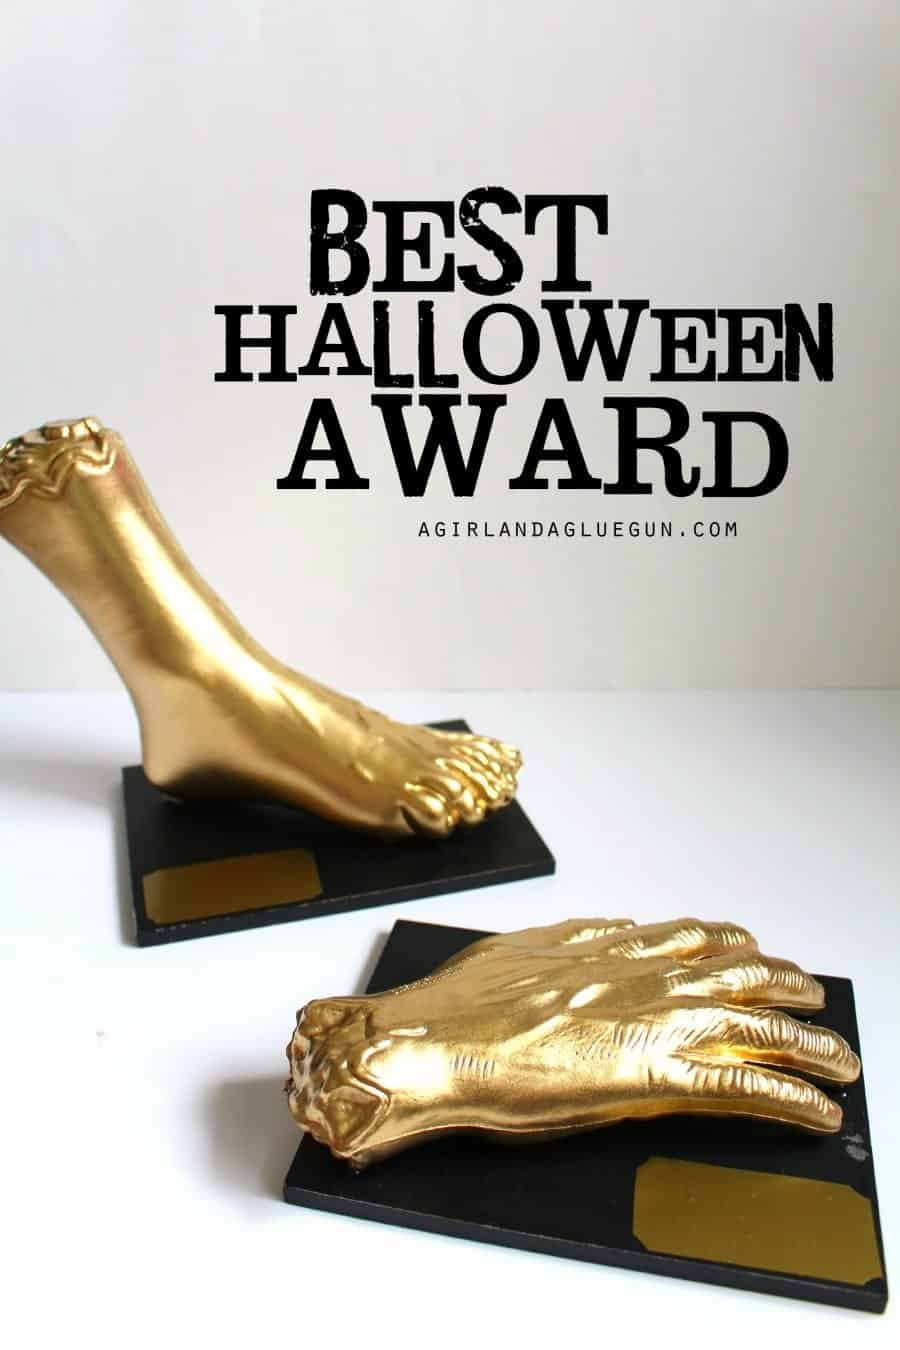 best award for halloween